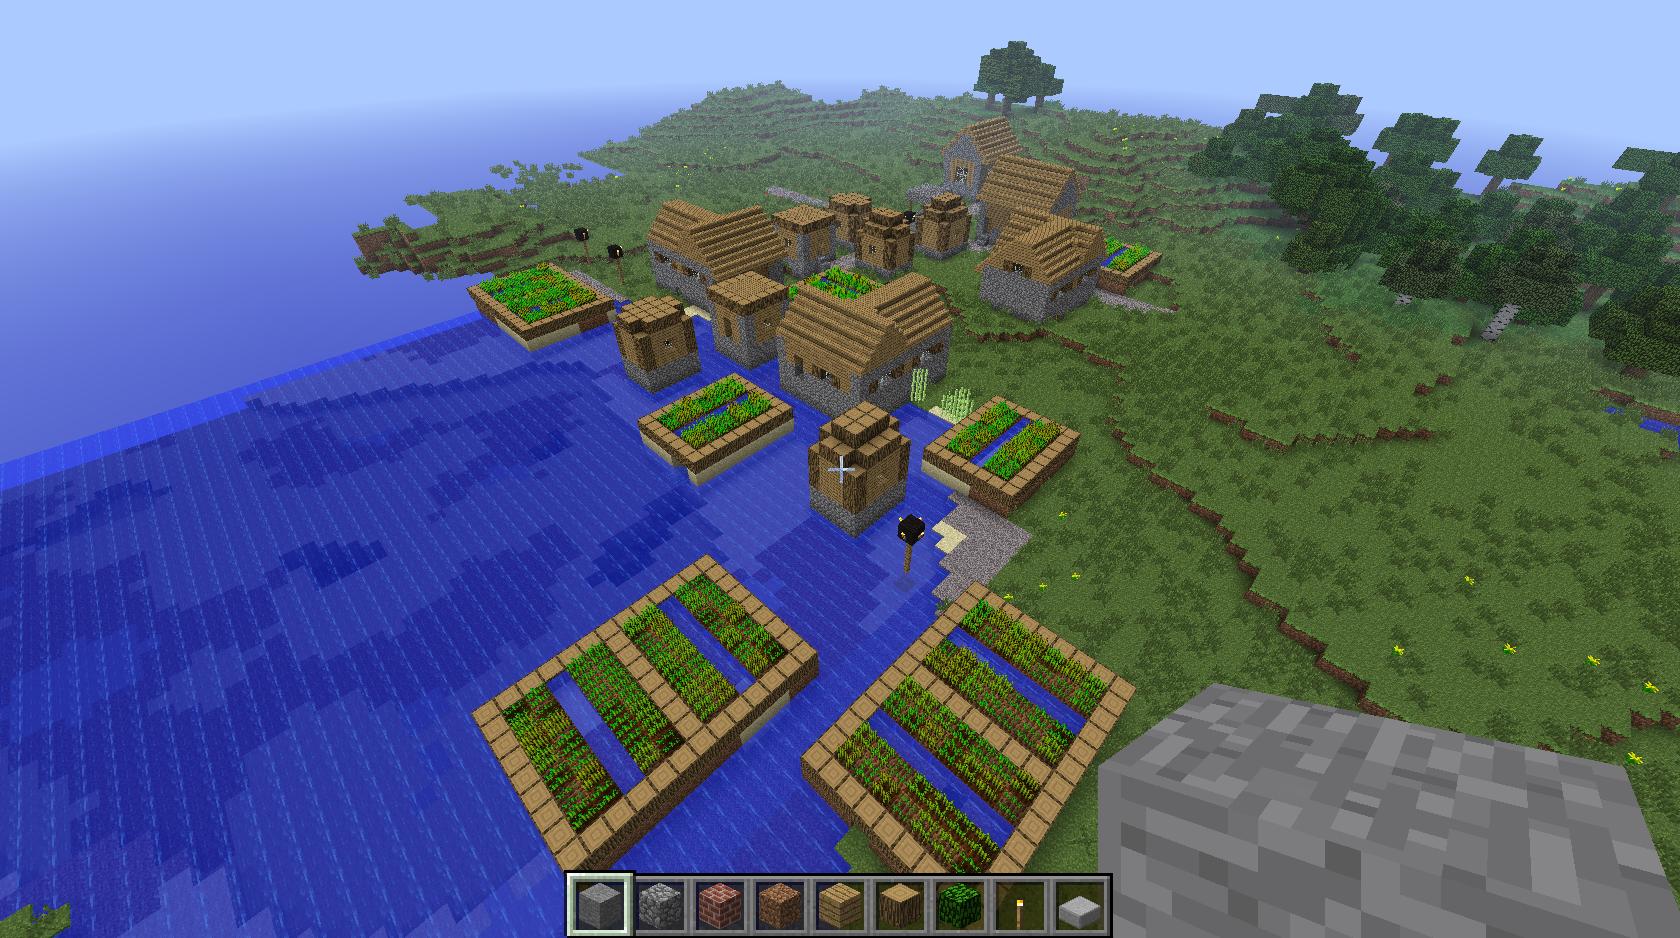 Minecraft Village Seed Code | www.imgkid.com - The Image ...